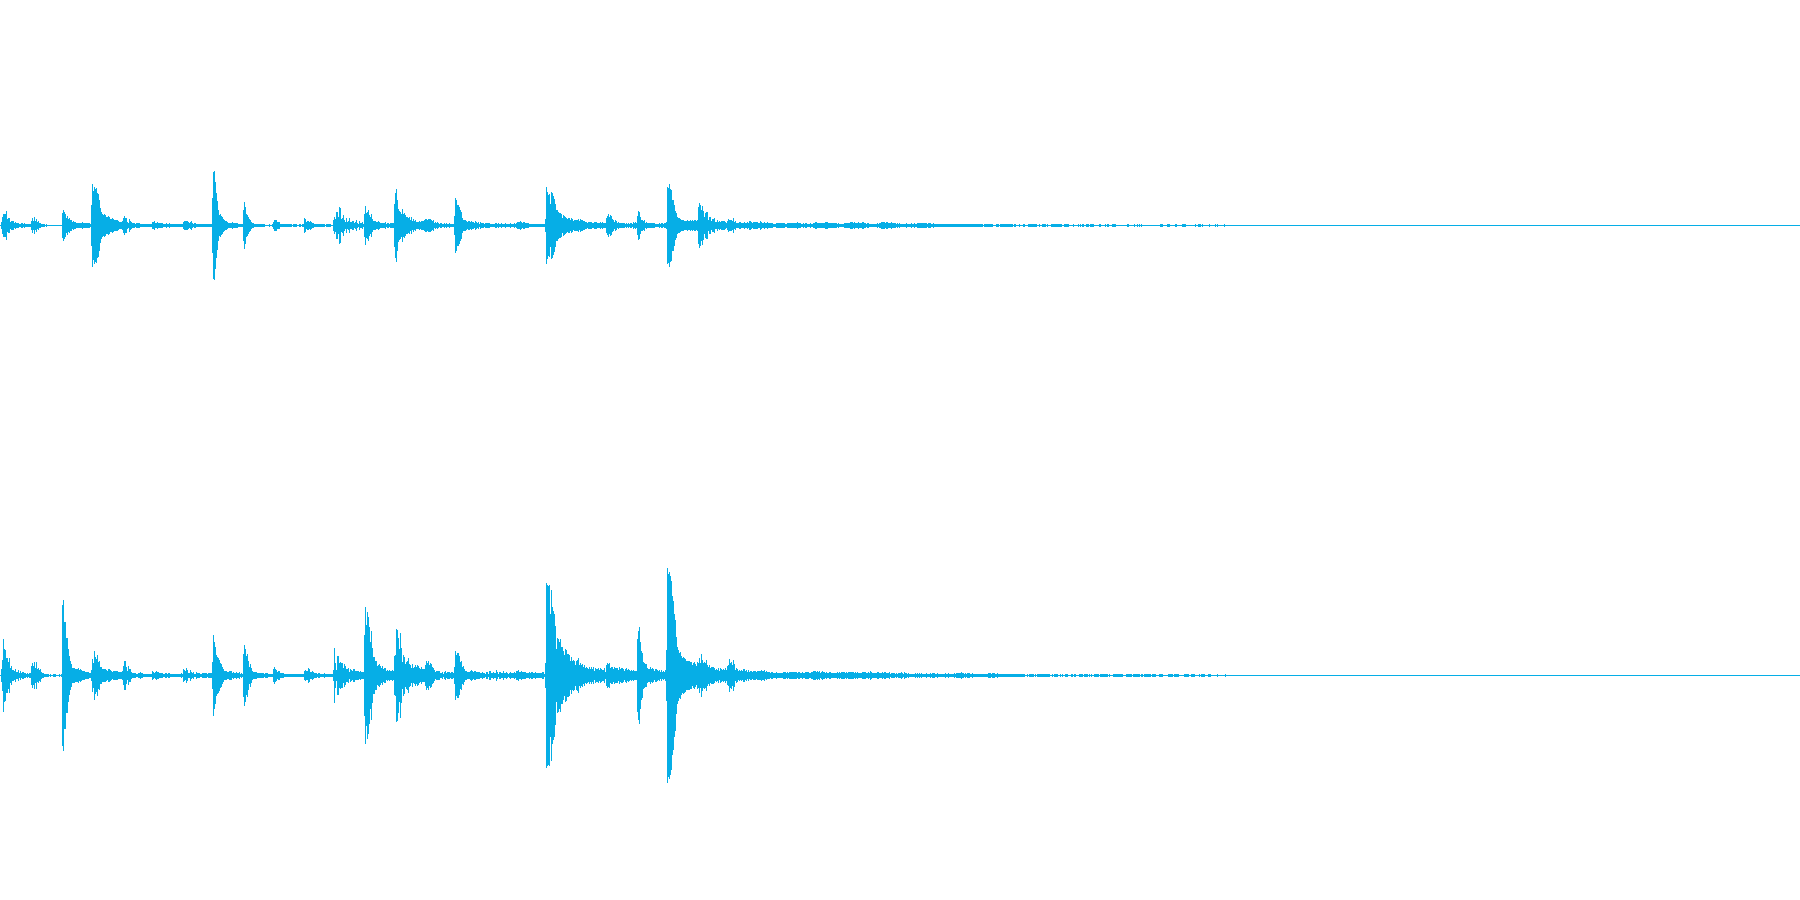 【SE 効果音】機会的なノイズ4の再生済みの波形